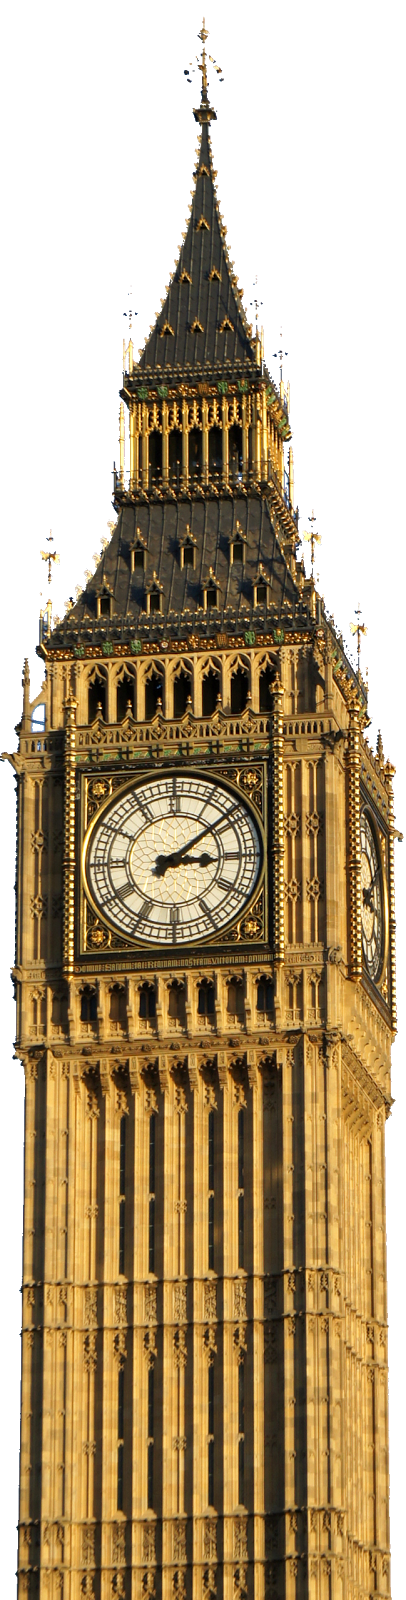 Tower clipart ben. London clock png transparent